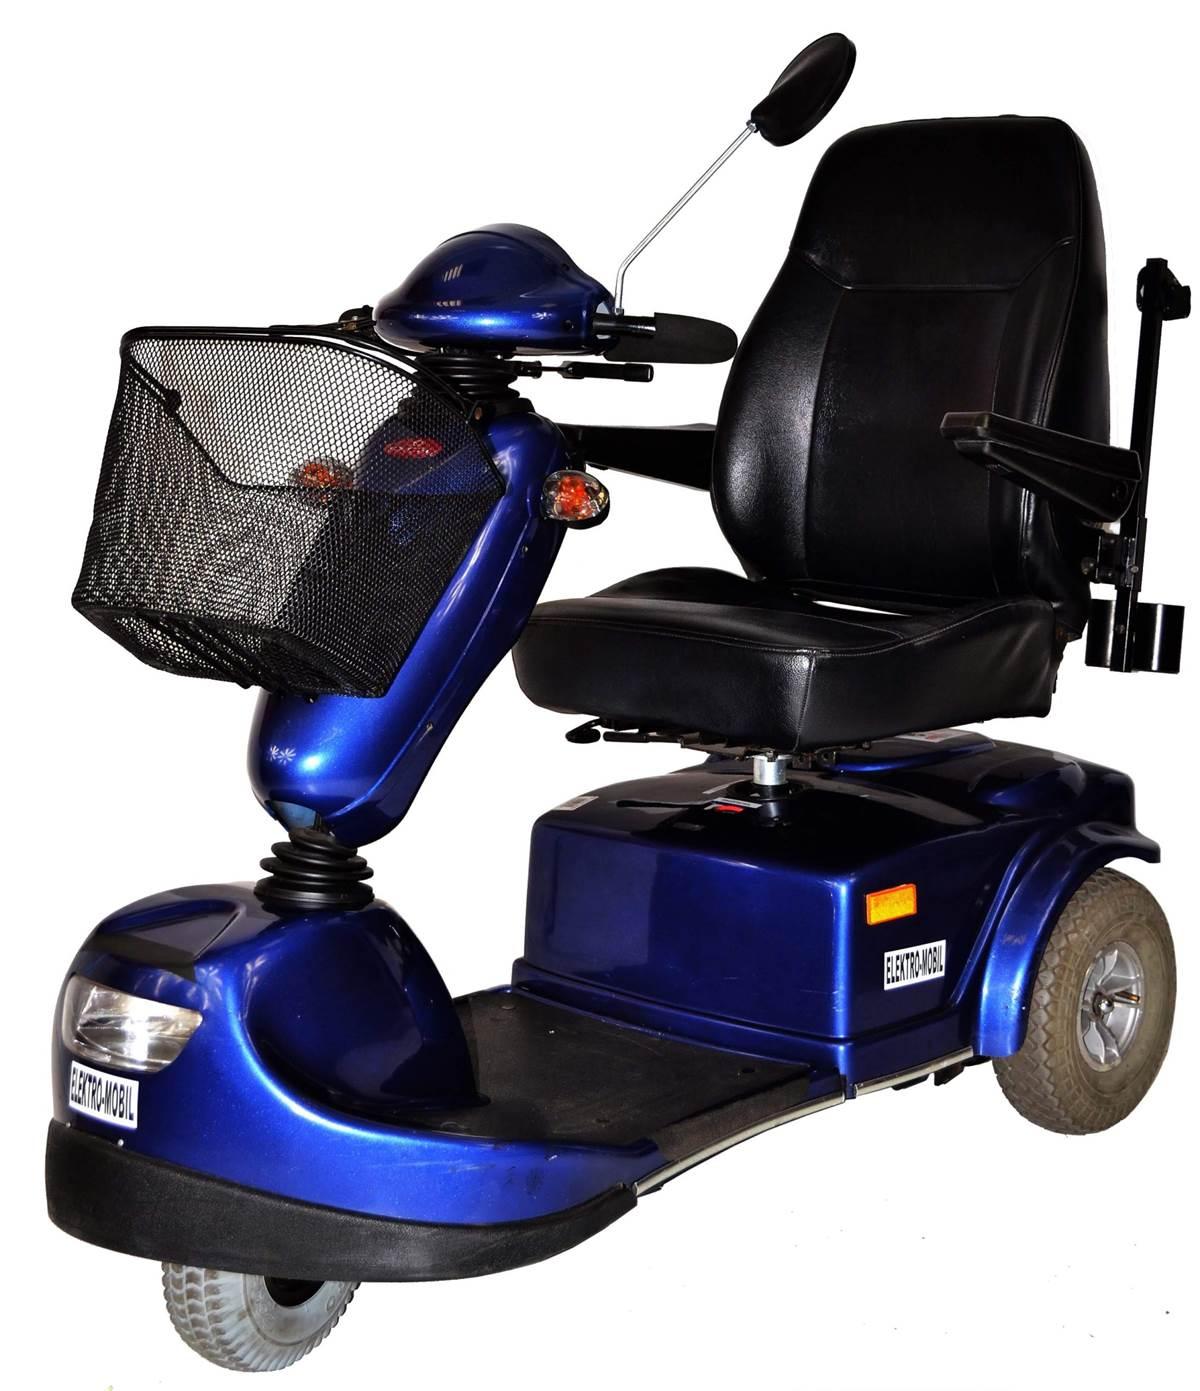 skuter inwalidzki elektryczny exel navigator